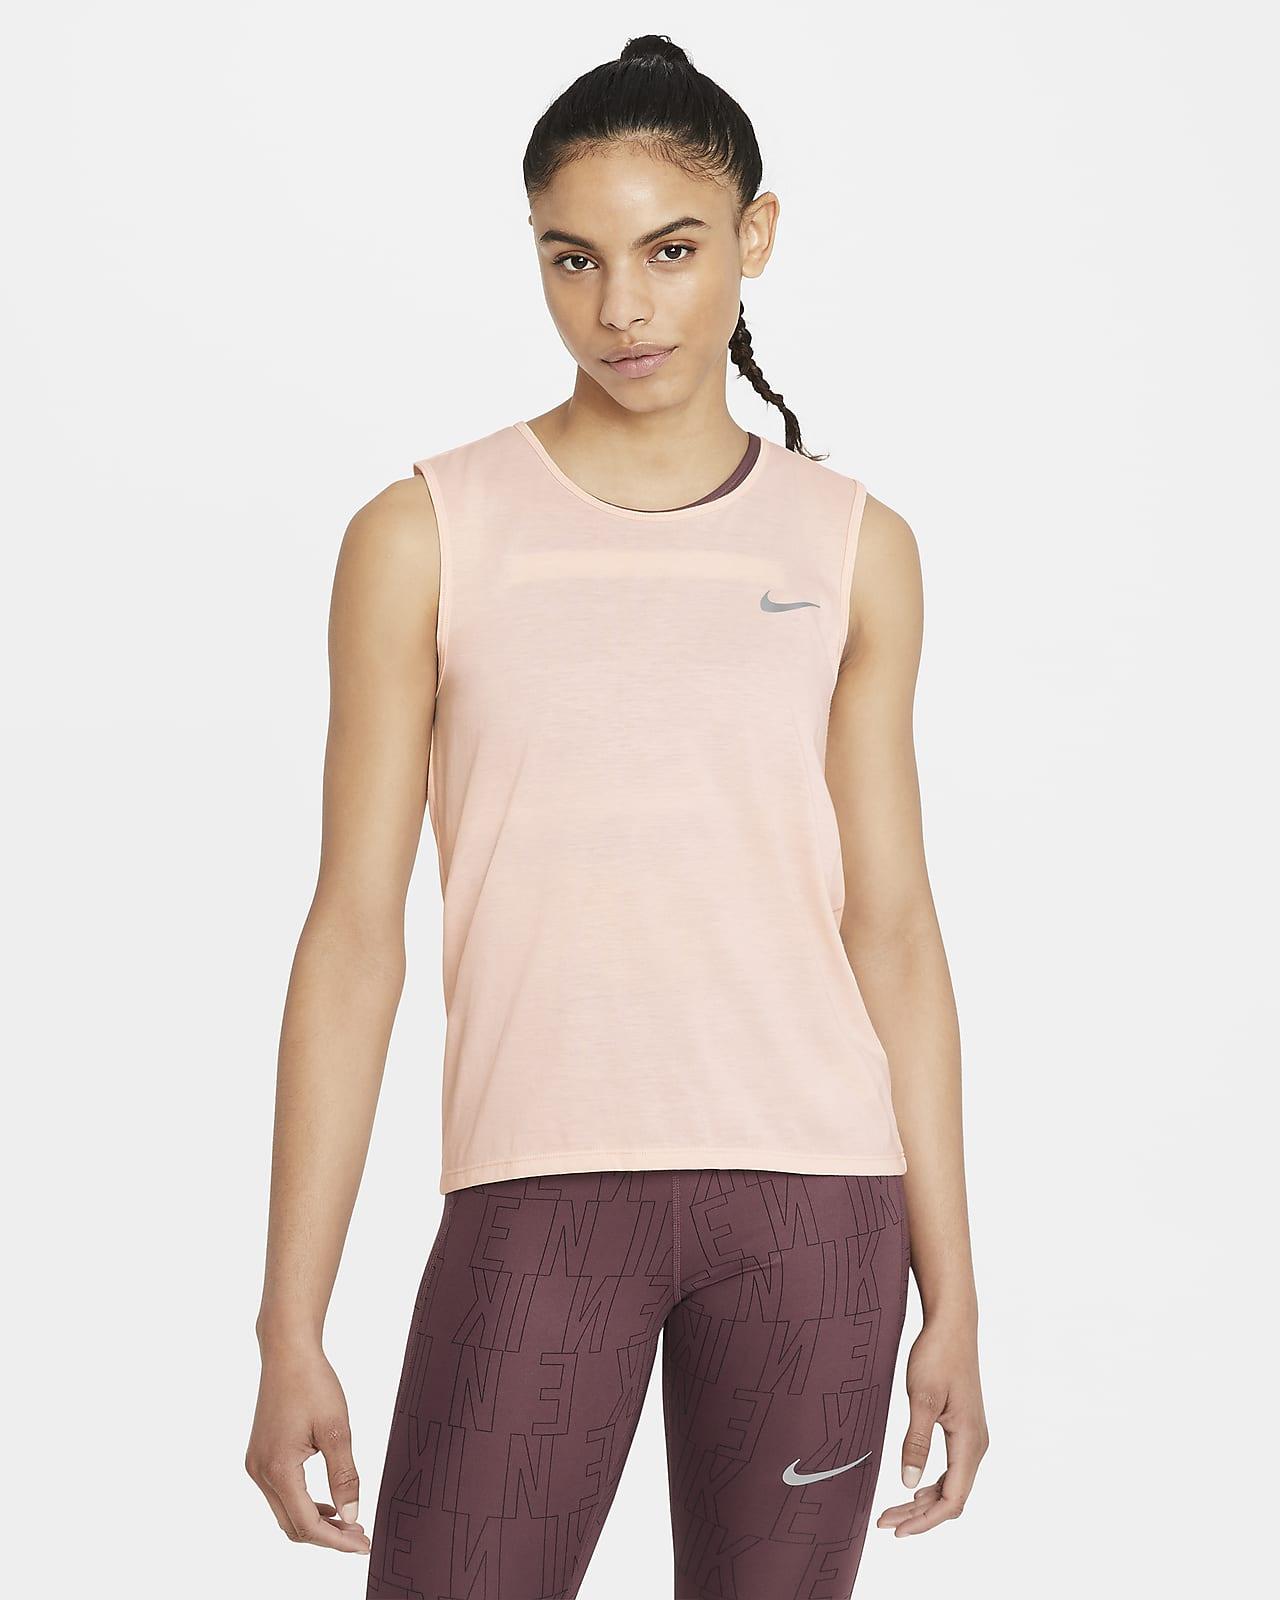 Nike Dri-FIT Run Division Women's Running Tank